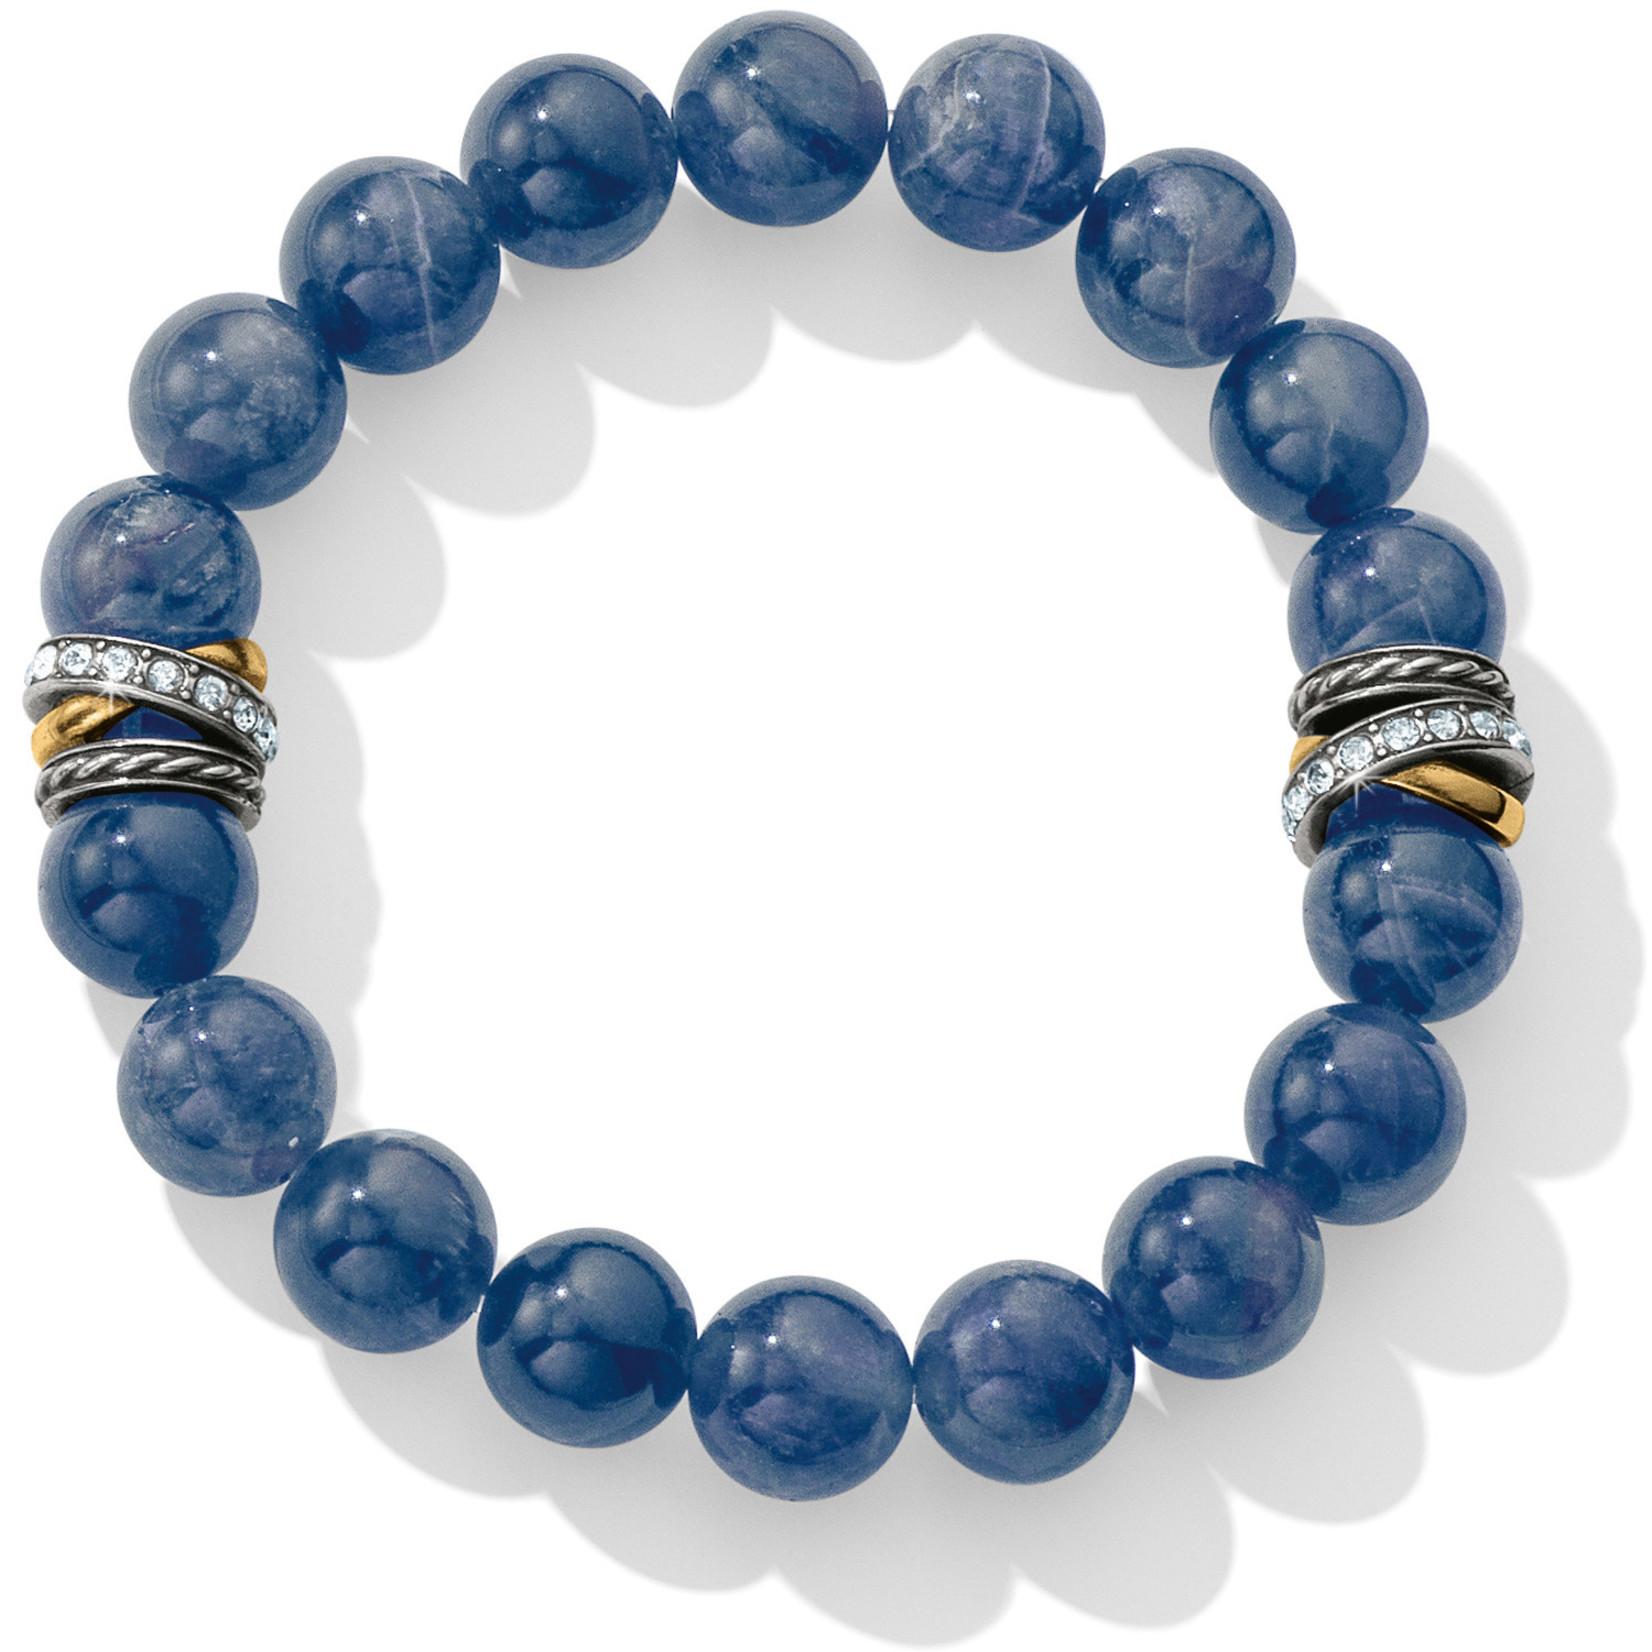 Brighton Neptune's Rings Brazil Blue Quartz Stretch Bracelet